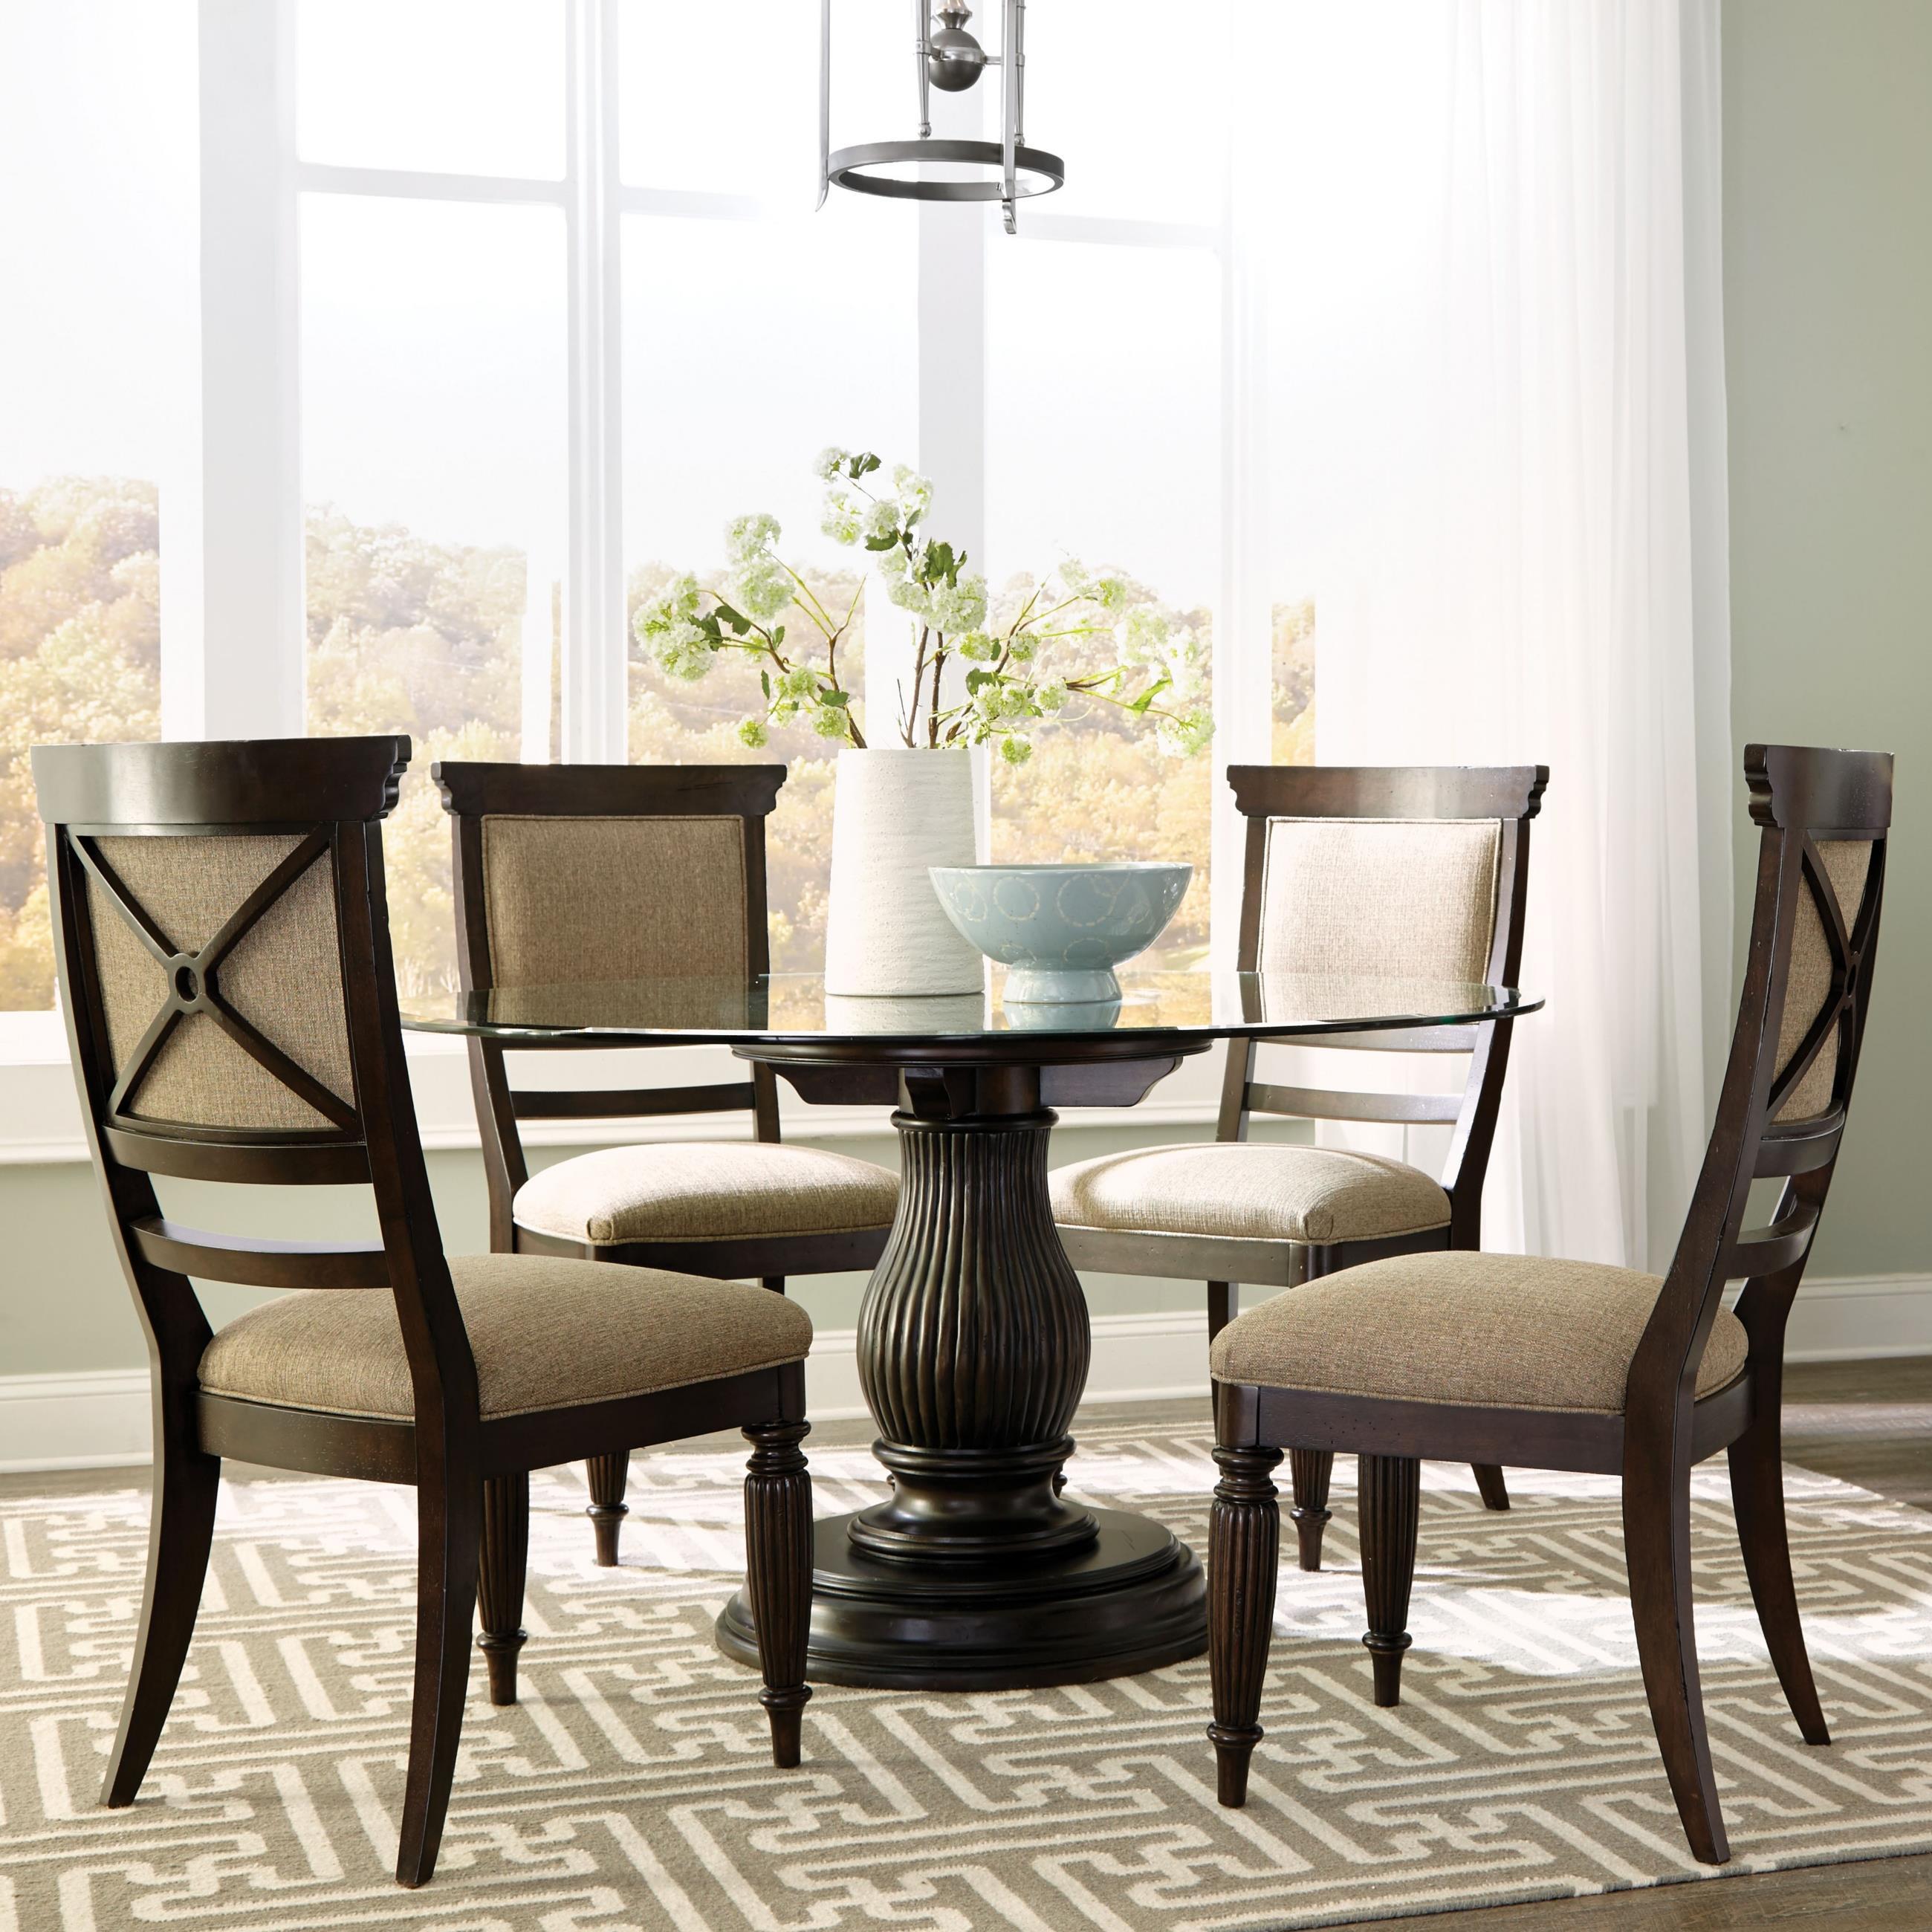 Broyhill Furniture Jessa 5 Piece Dining Set - Item Number: 4980-551+531+4x583